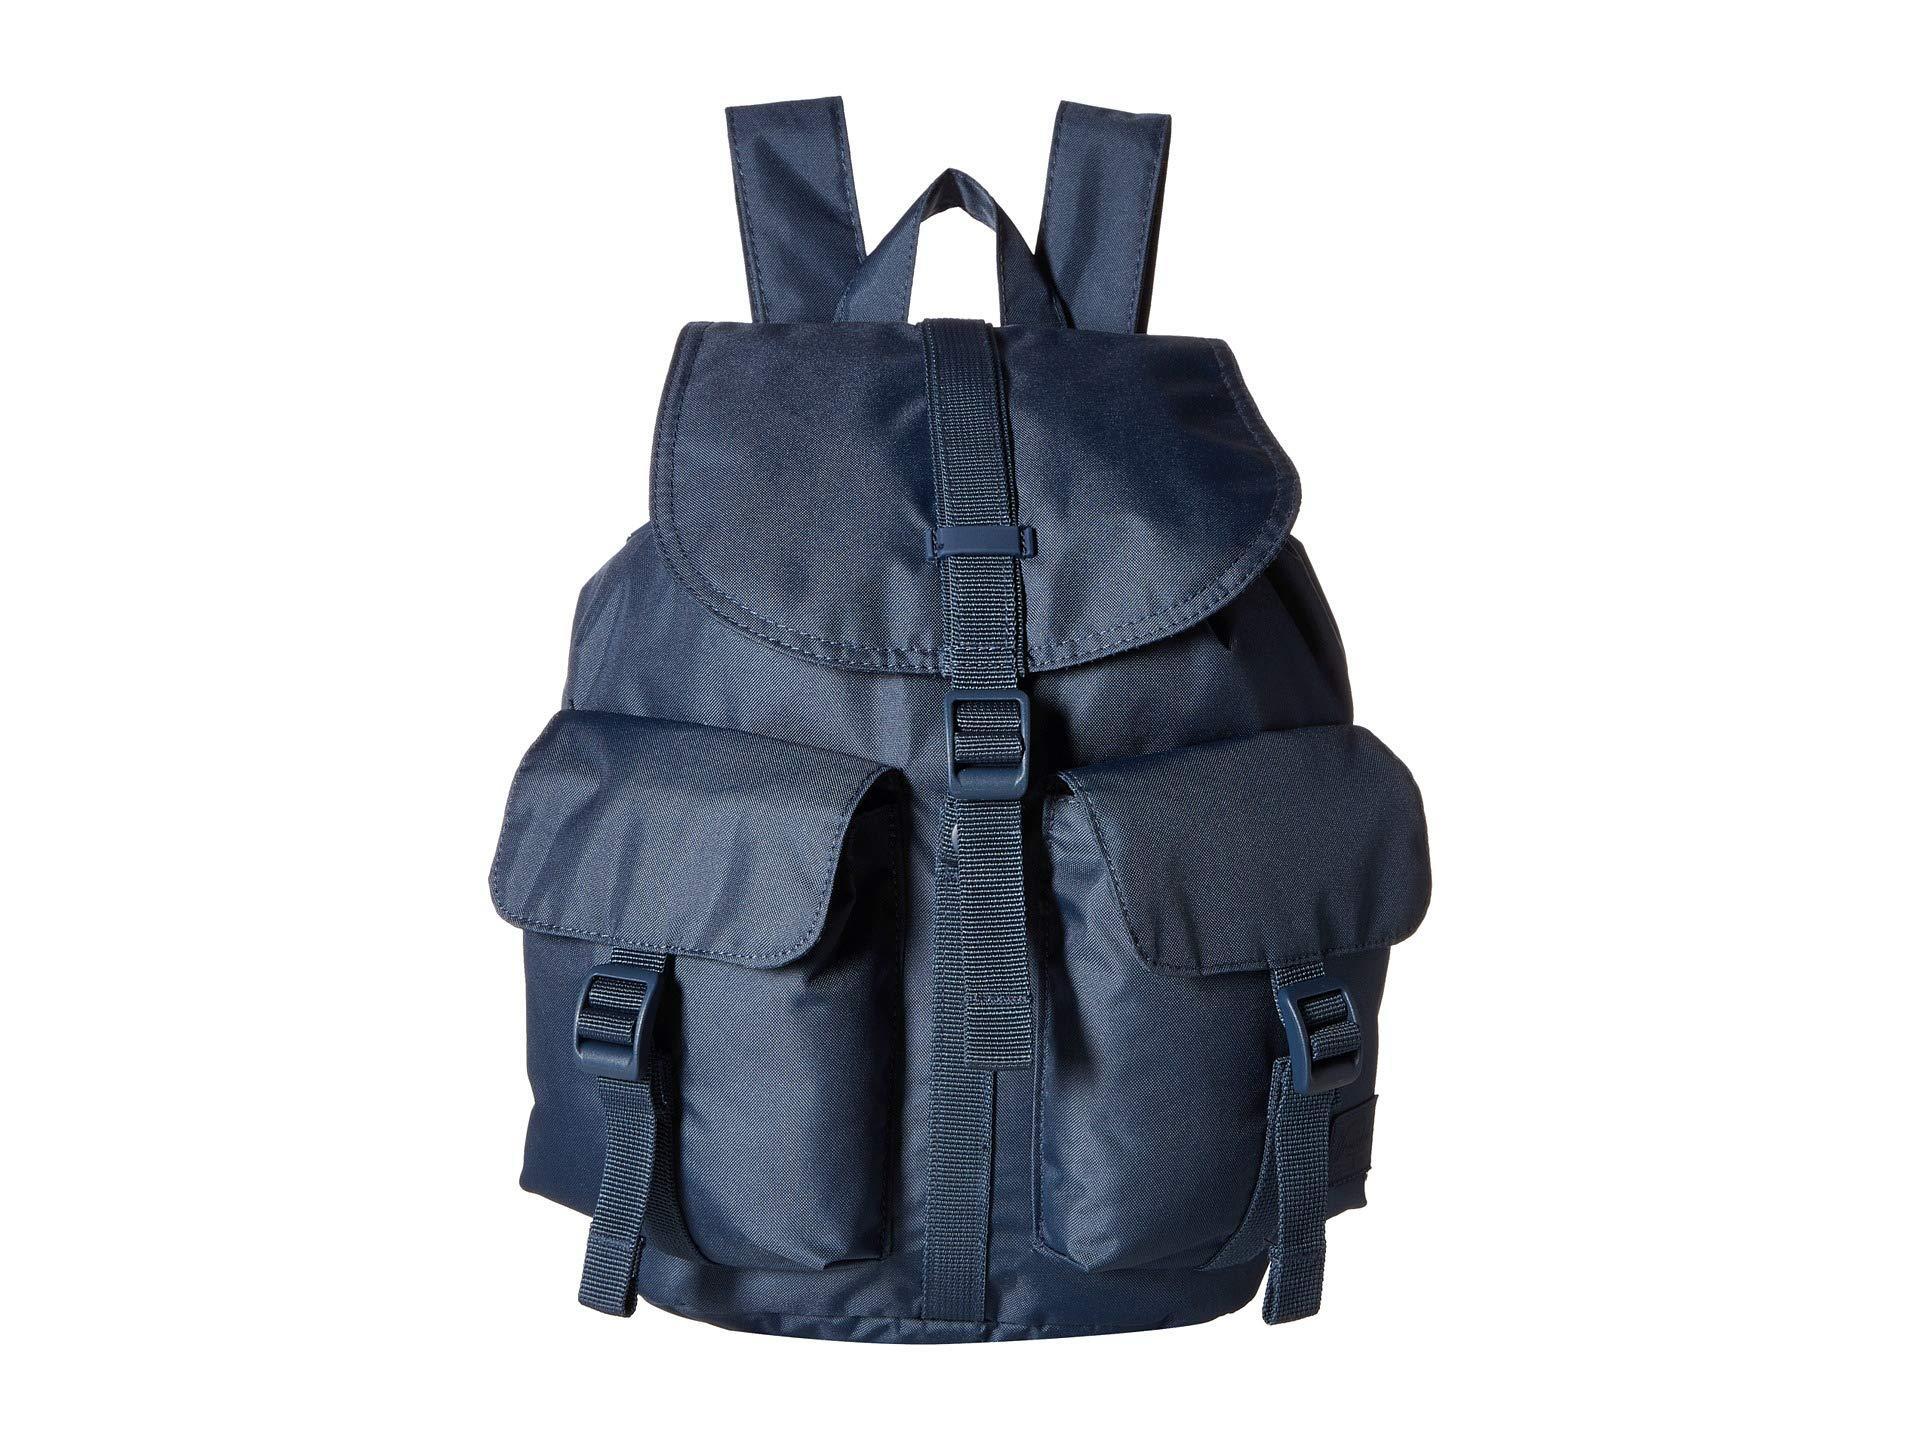 d8a20c642e5 Lyst - Herschel Supply Co. Dawson Light (cypress) Backpack Bags in ...